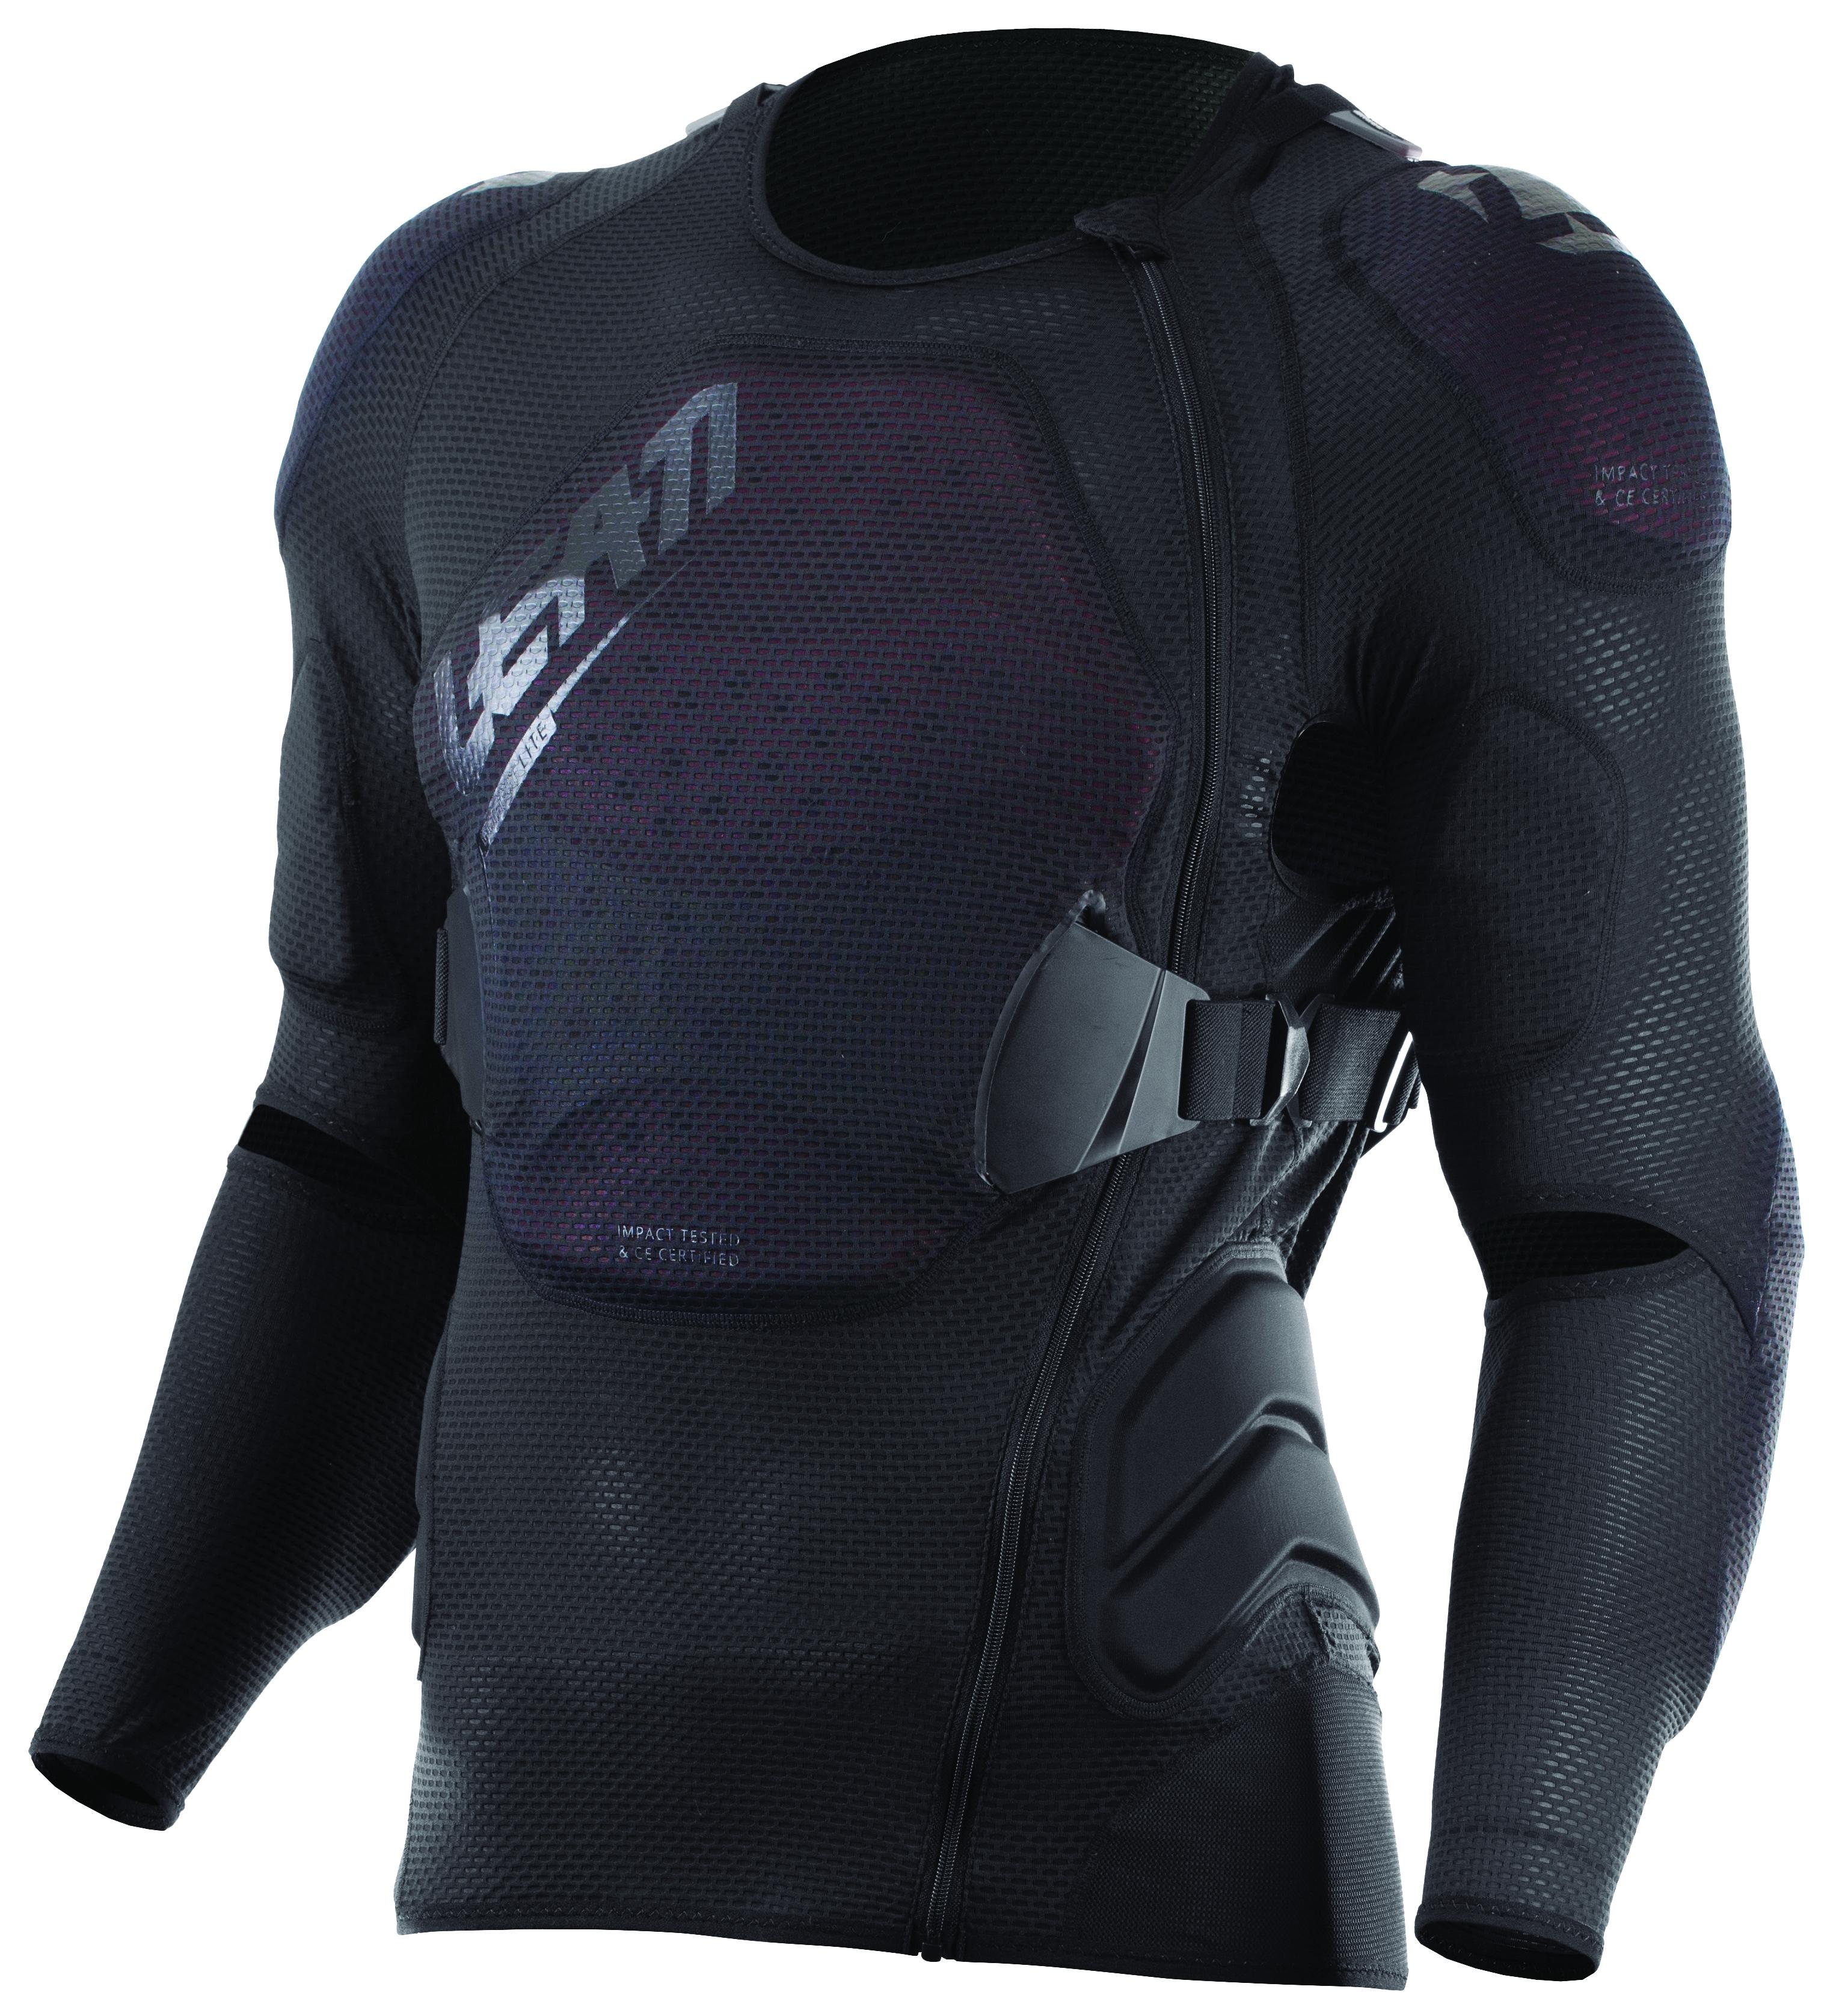 Heated Motorcycle Jacket >> Leatt 3DF AirFit Lite Body Protector - RevZilla